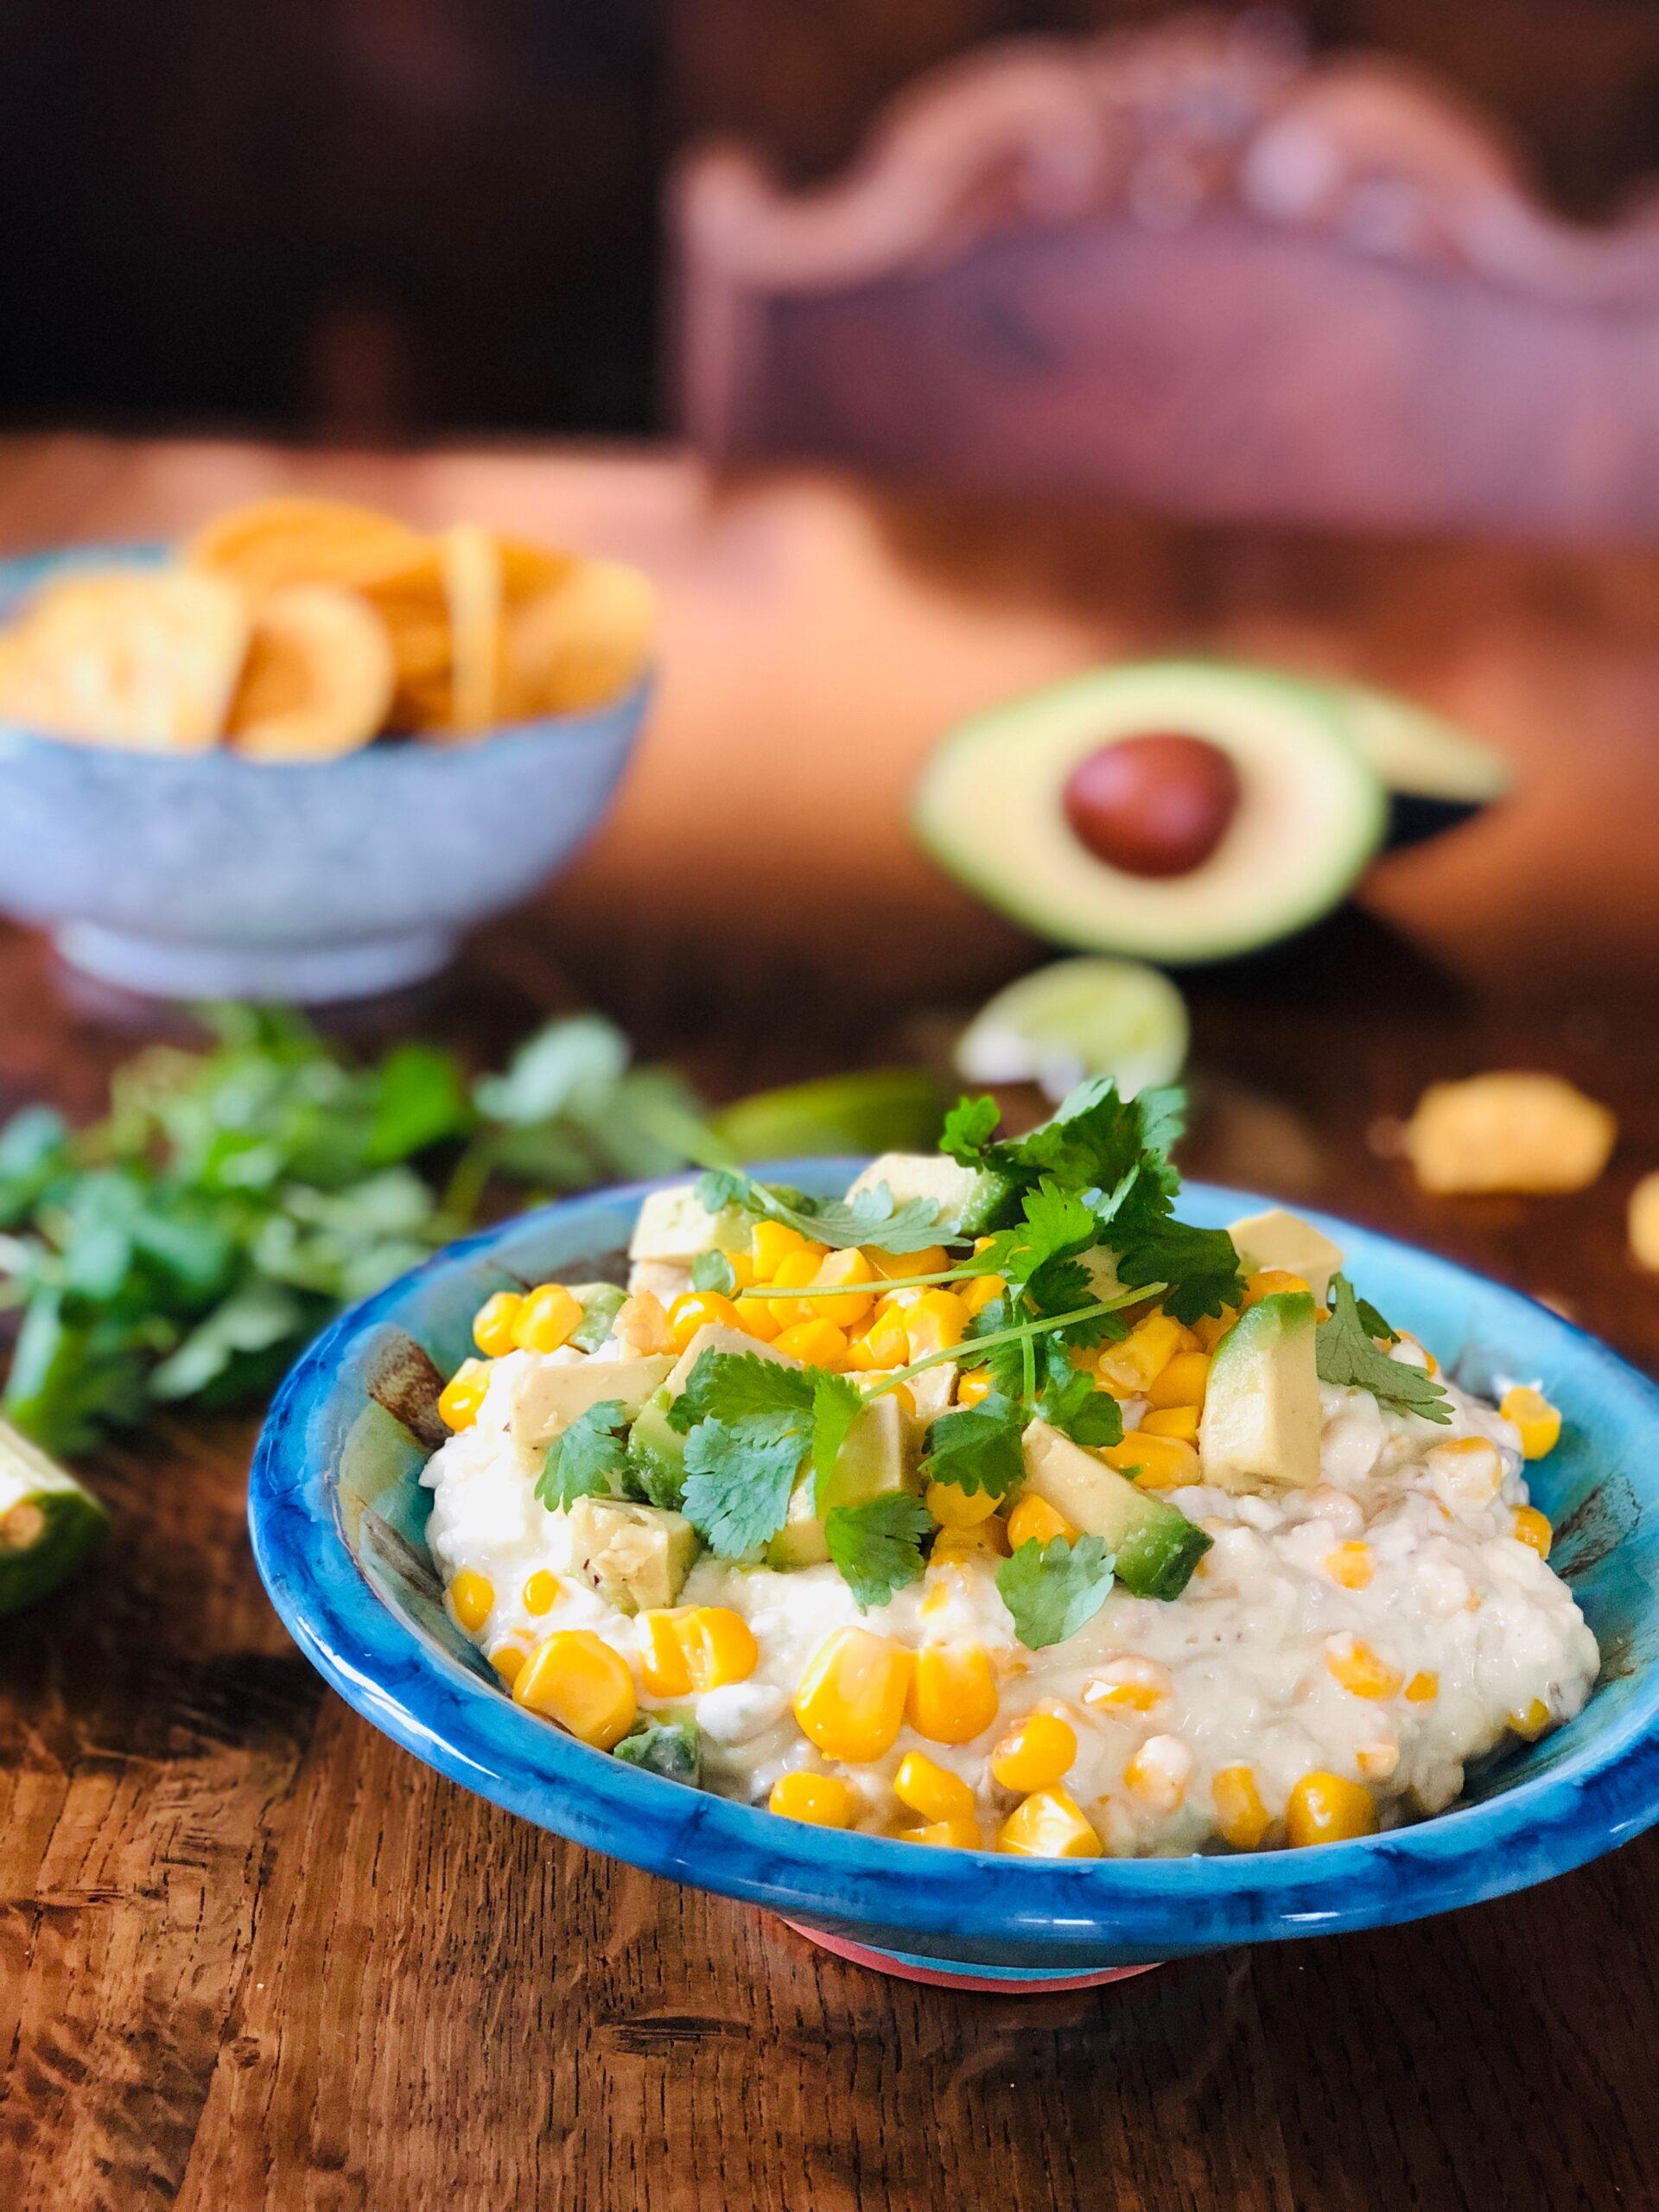 Creamy corndip med mais, avokado, majones, hvitløk, lime og nachos